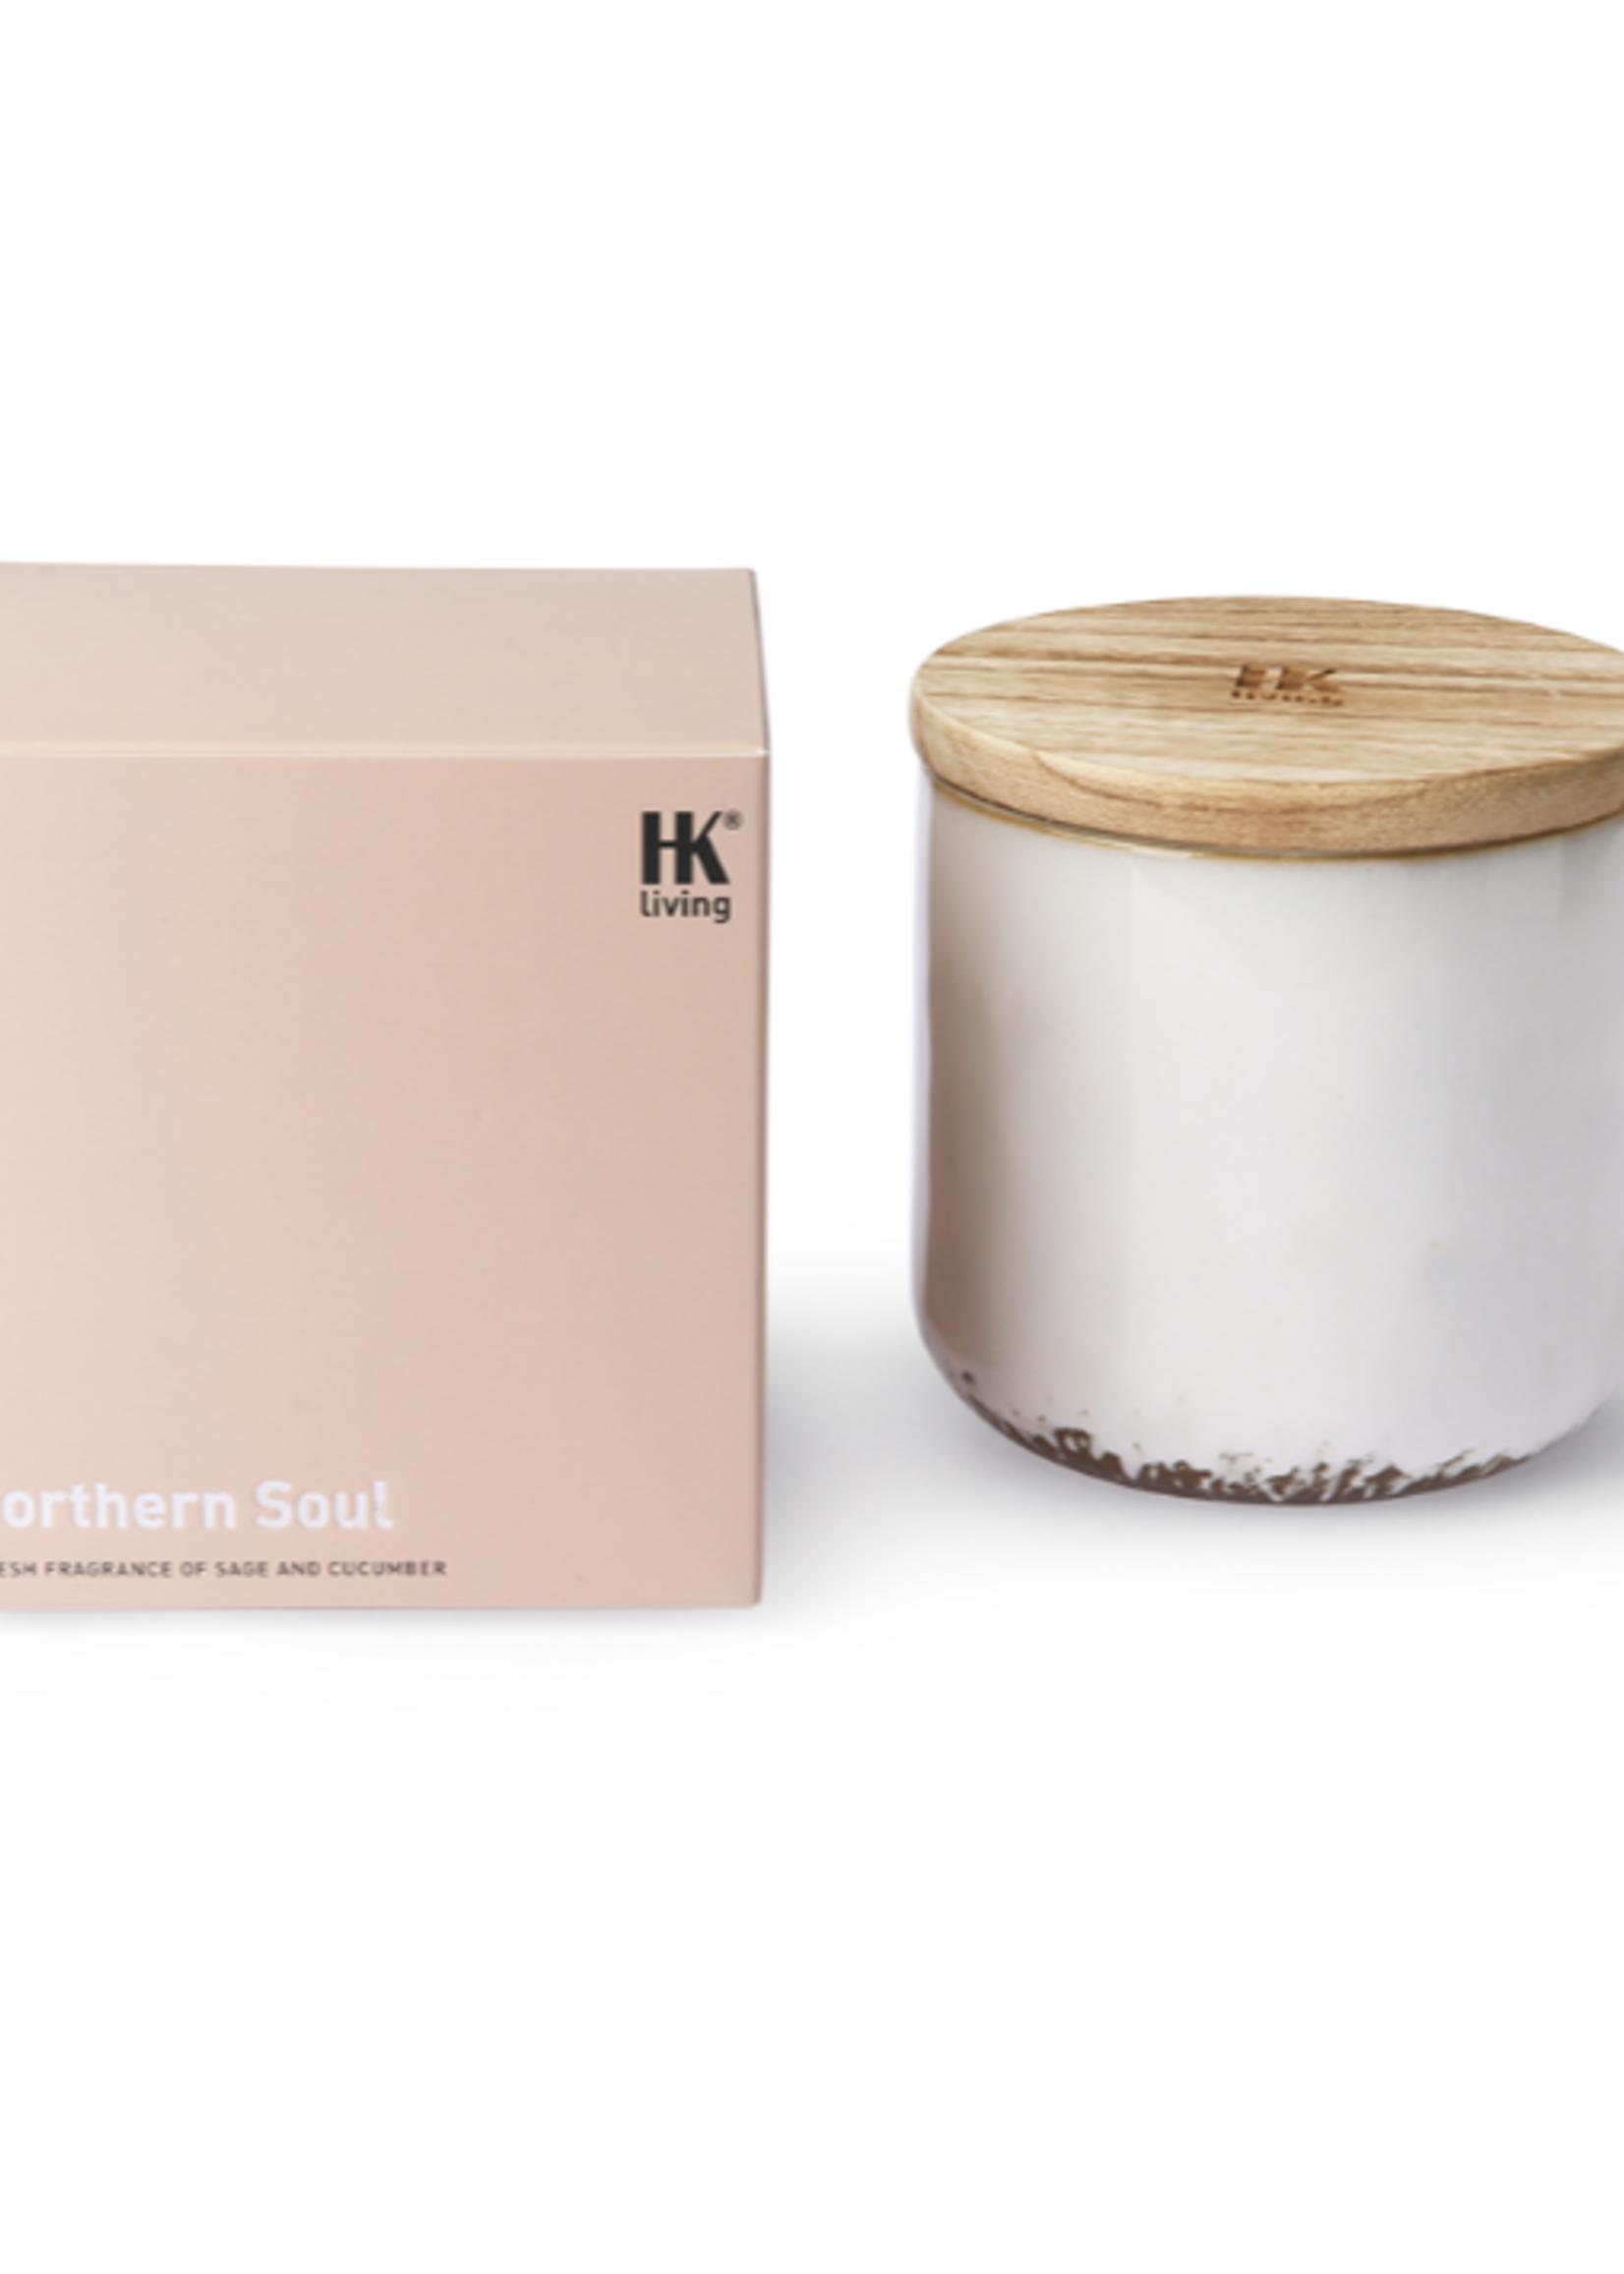 HKliving ceramic scented candle:  northern soul